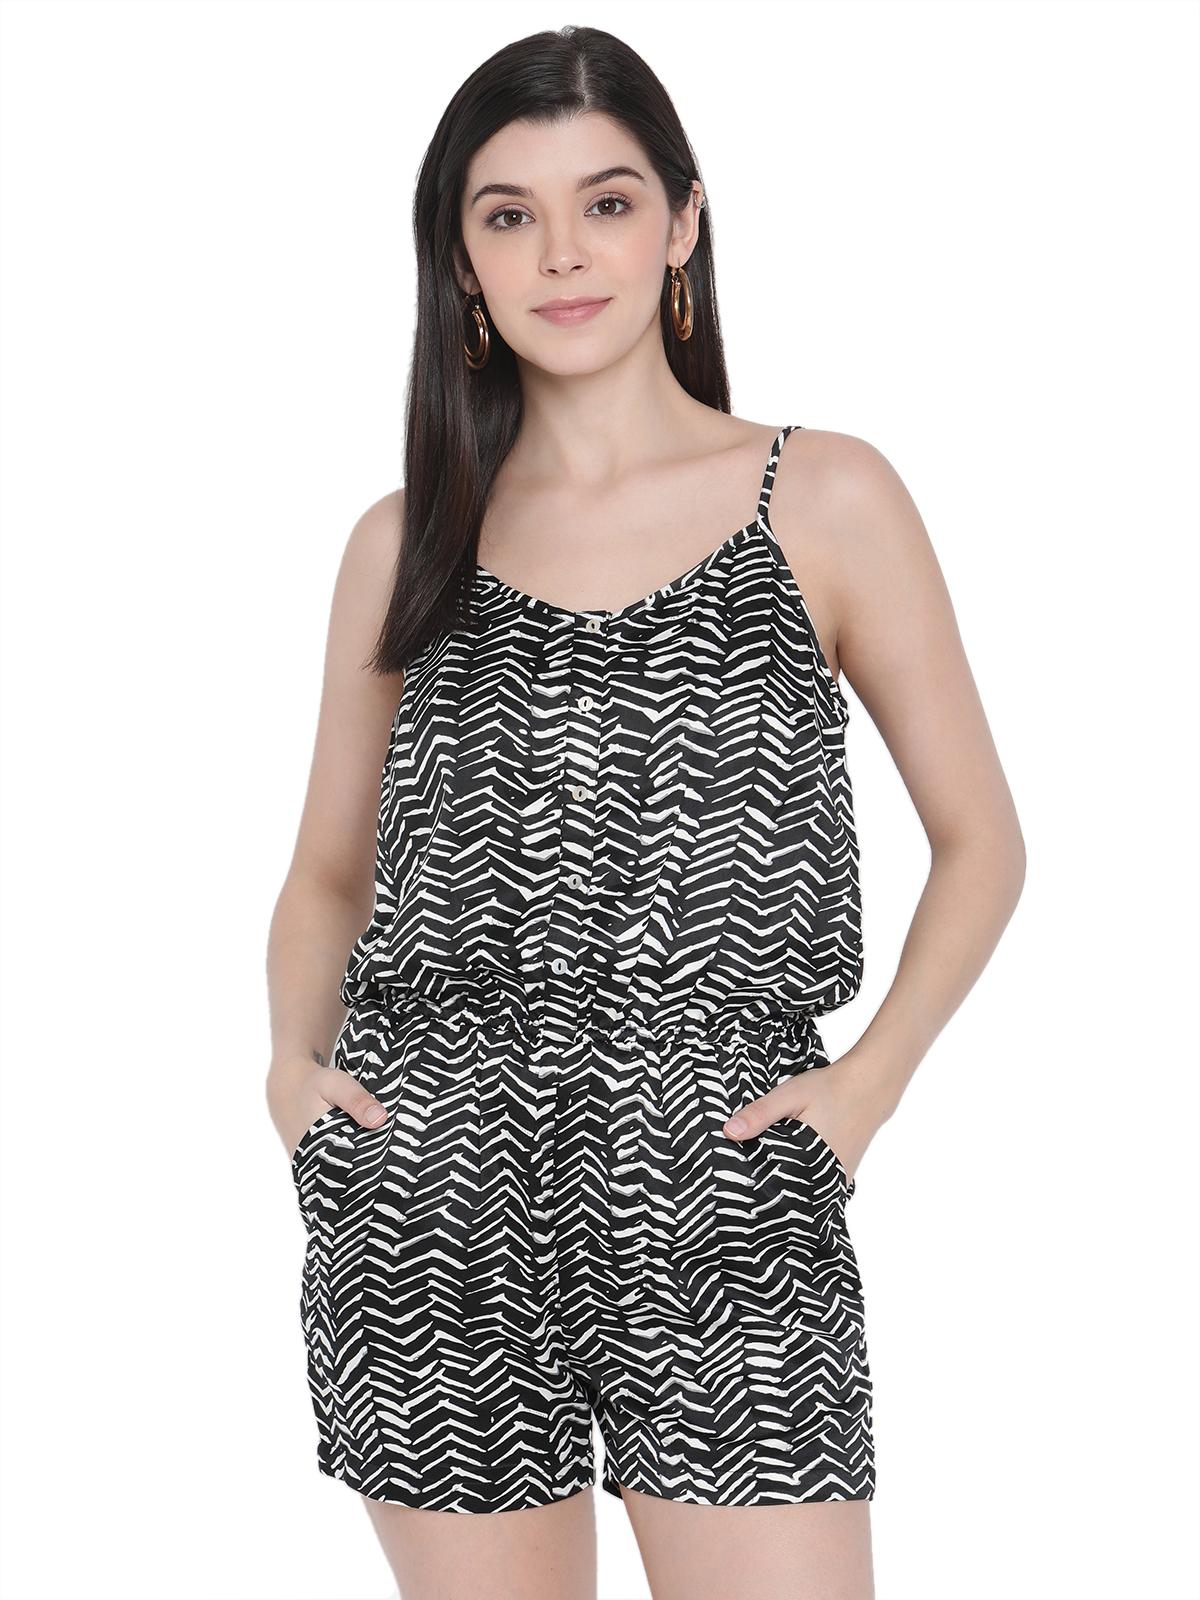 Porsorte | PORSORTE Womens Spagetti Straps Black and White Printed Playsuit